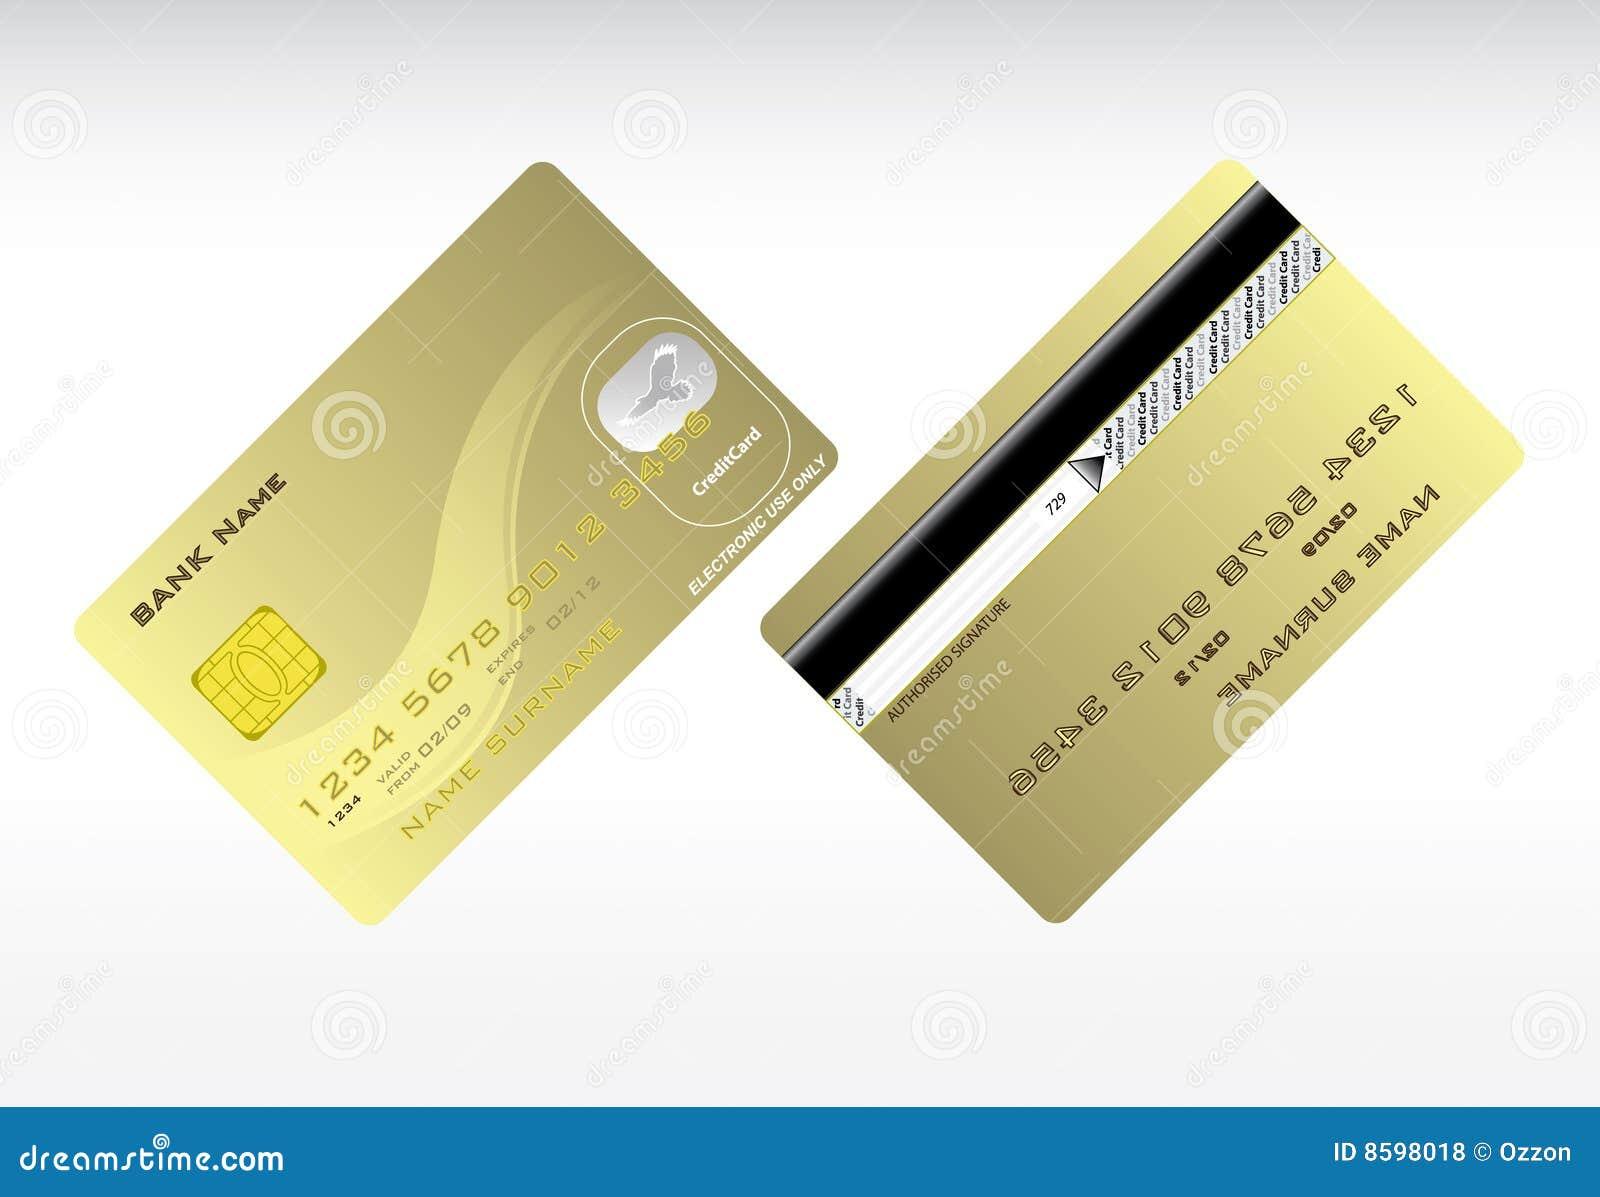 credit cards - Plastic Credit Card